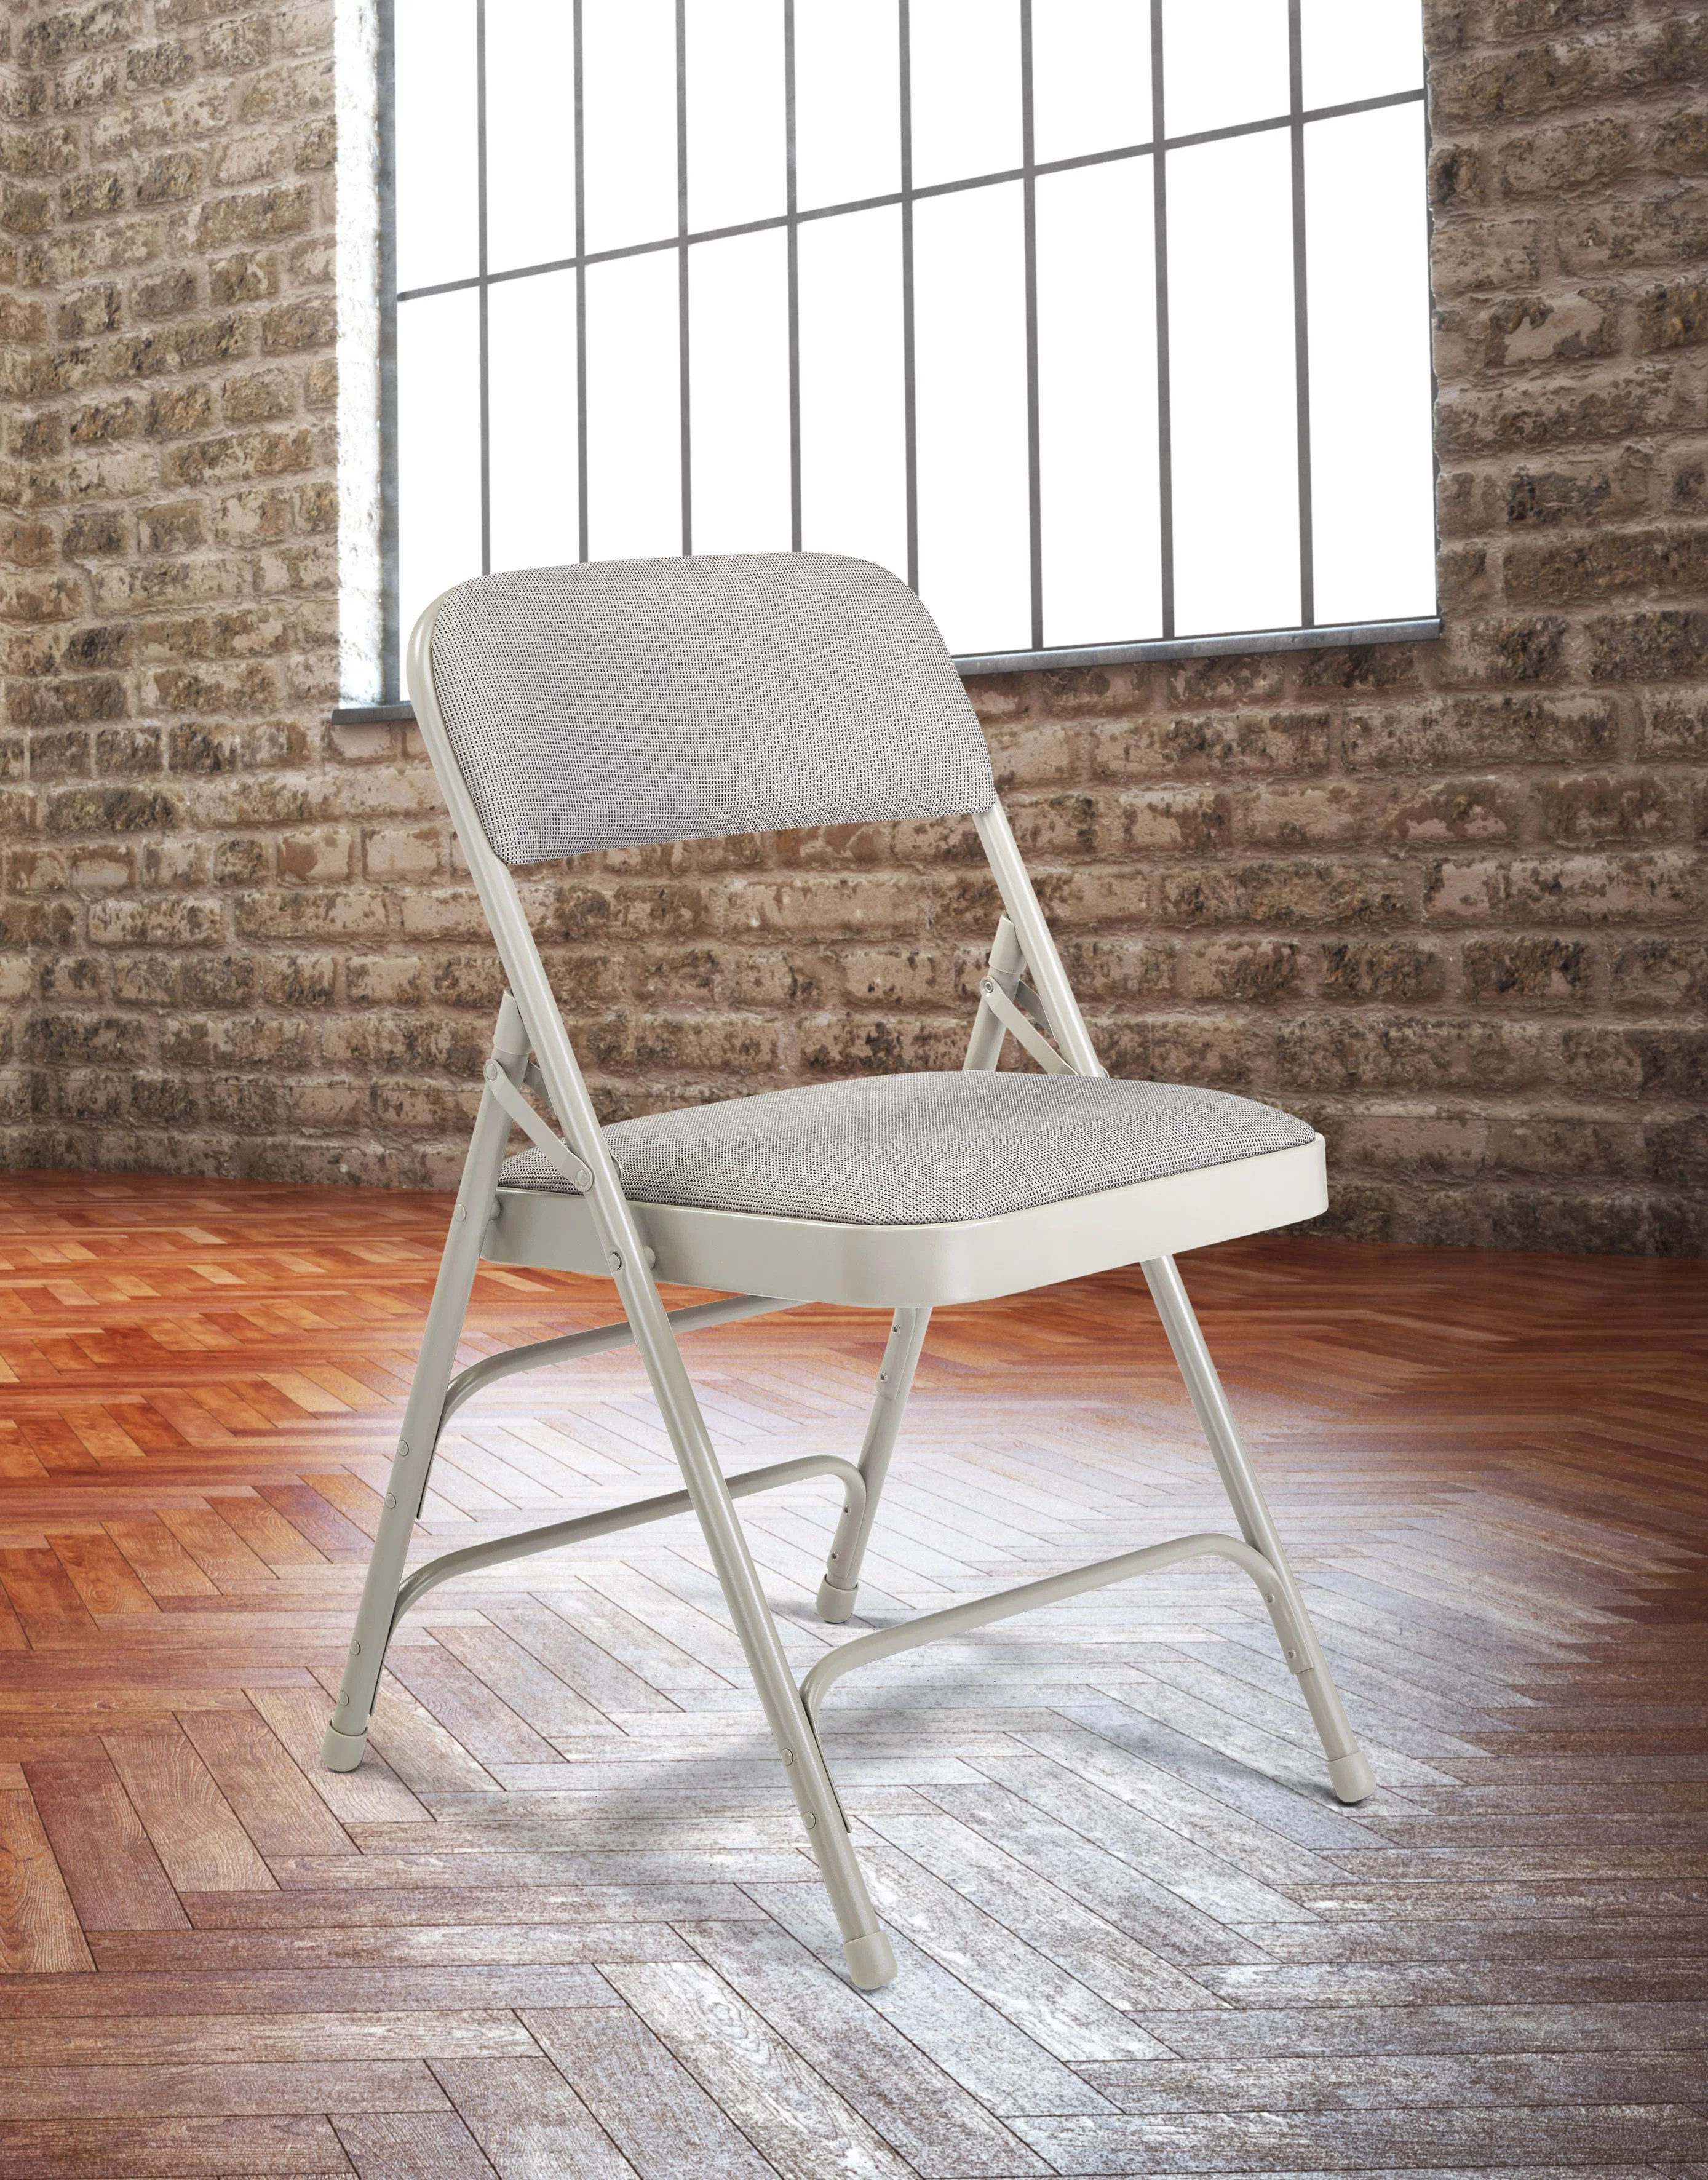 cloth padded folding chairs ikea chair cushions national public seating 2300 series fabric reviews wayfair